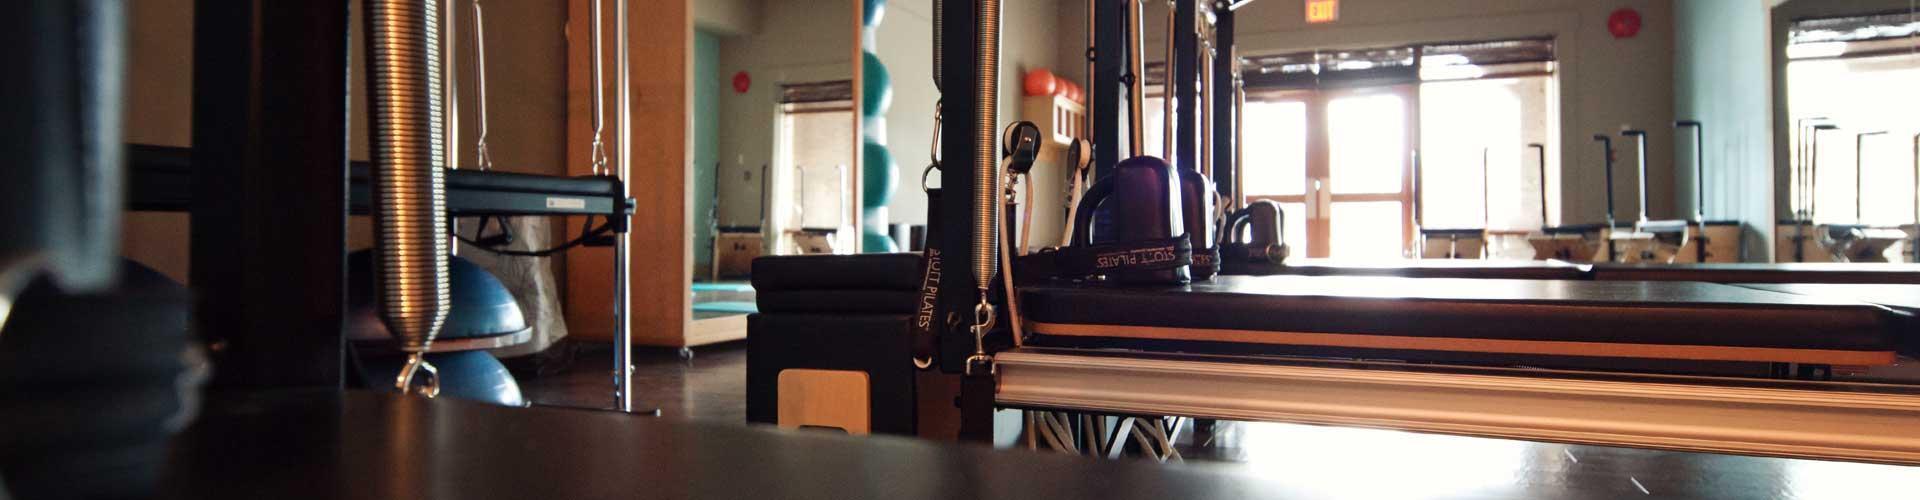 The Movement Company Invermere - Pilates & Functional Training Studio